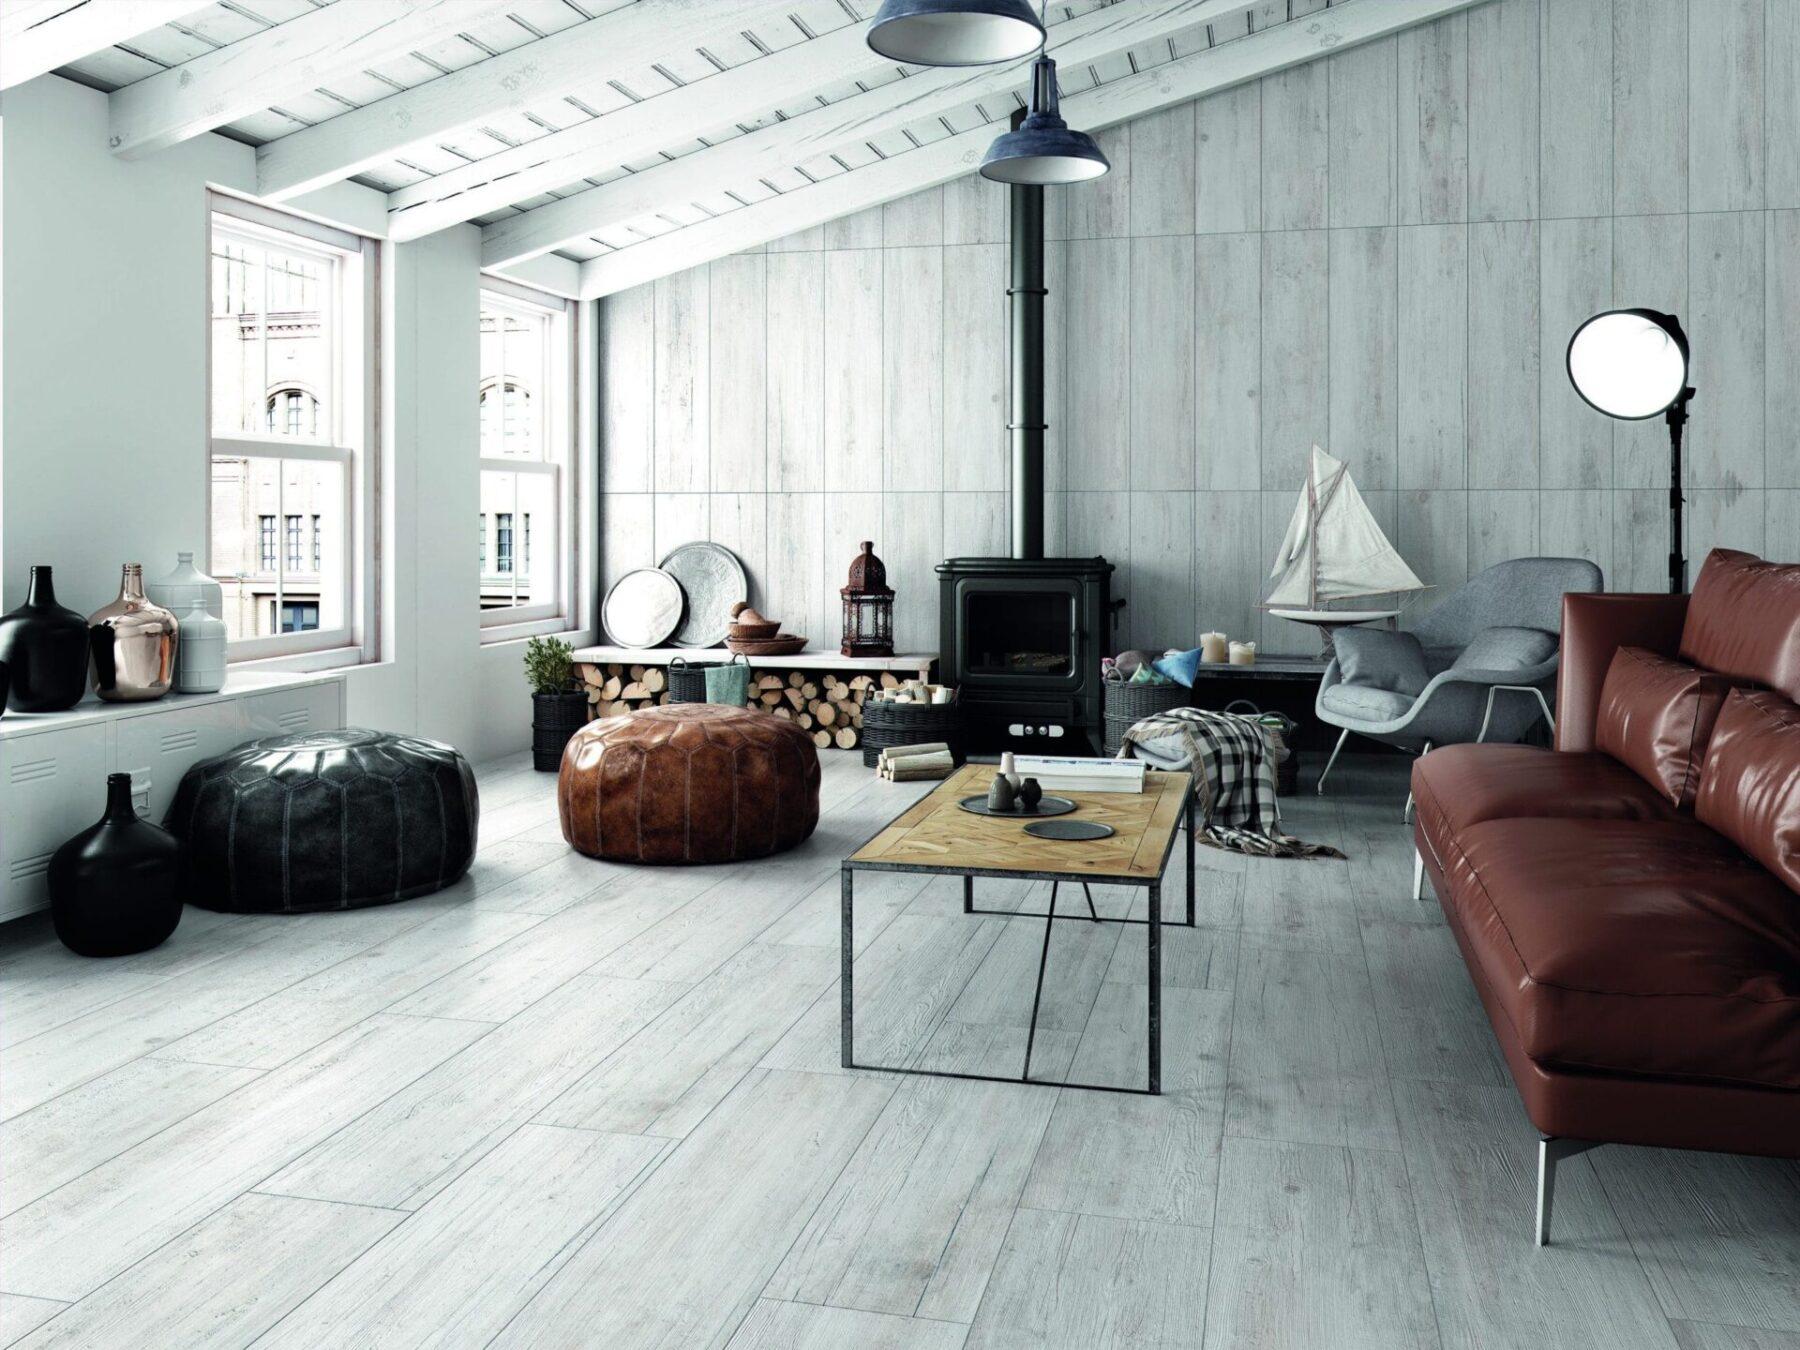 Next Generation Flooring – Introducing the Halmstad Range